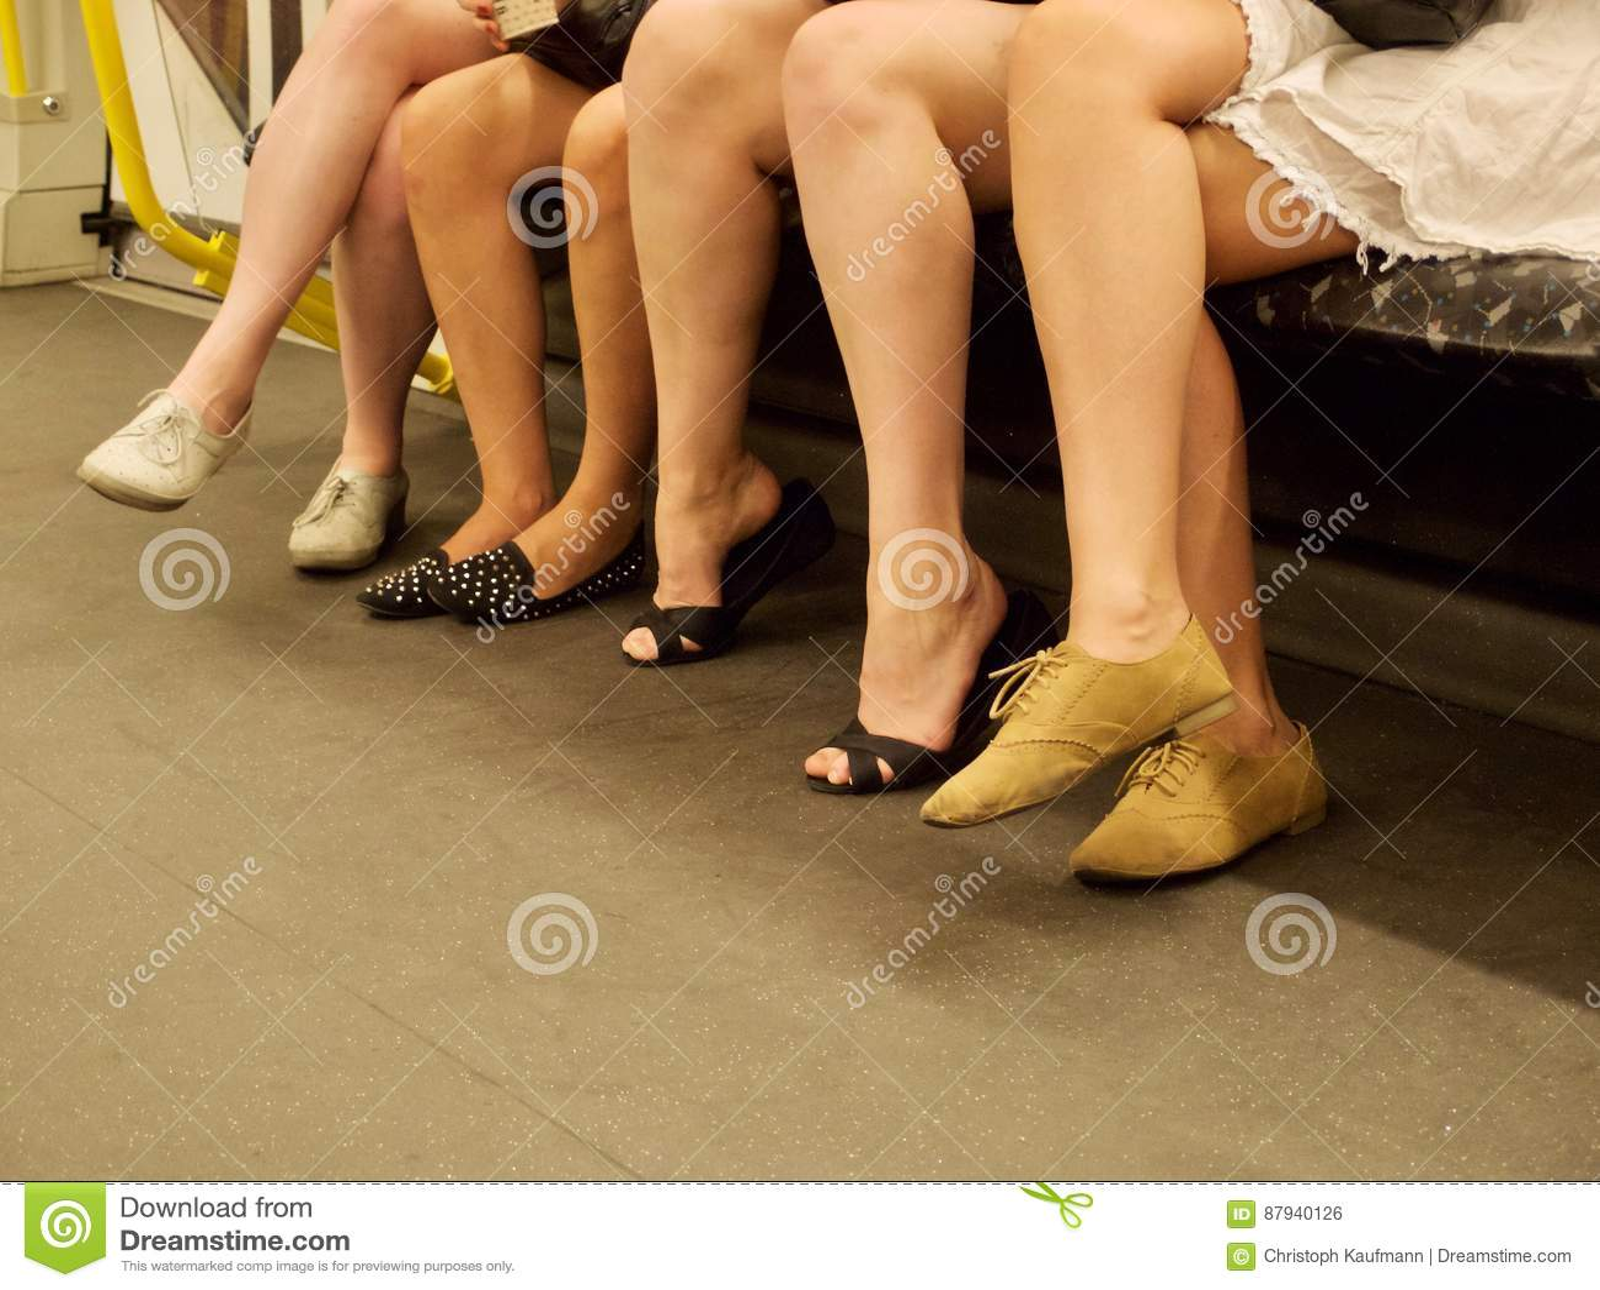 Srilankan chicas desnudas coño fotos